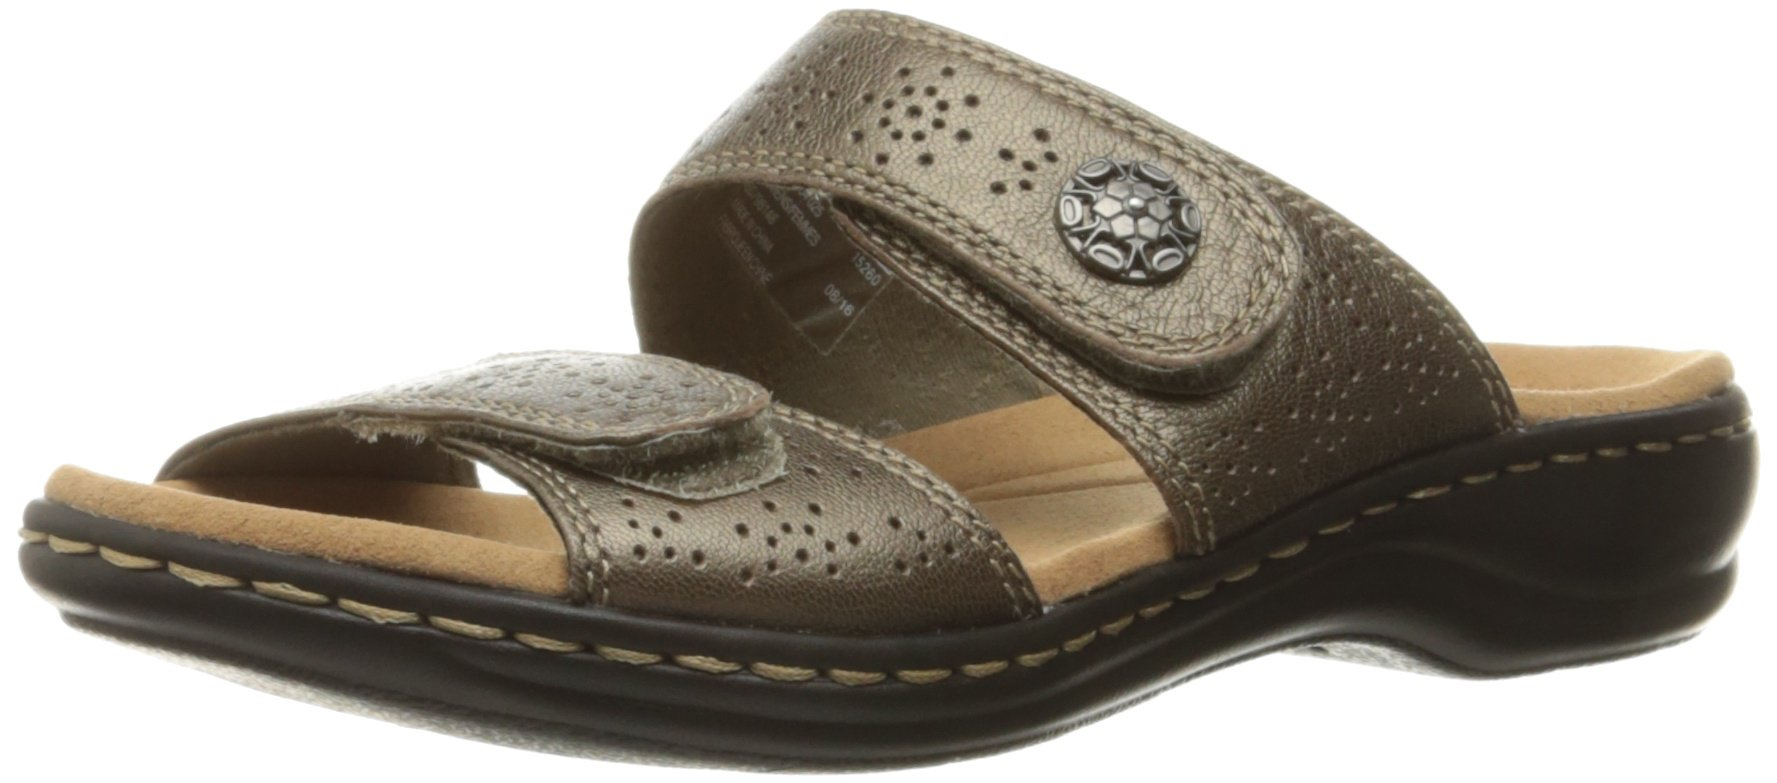 CLARKS Women's Leisa Lacole Slide Sandal, Pewter Metallic Leather, 6 M US by CLARKS